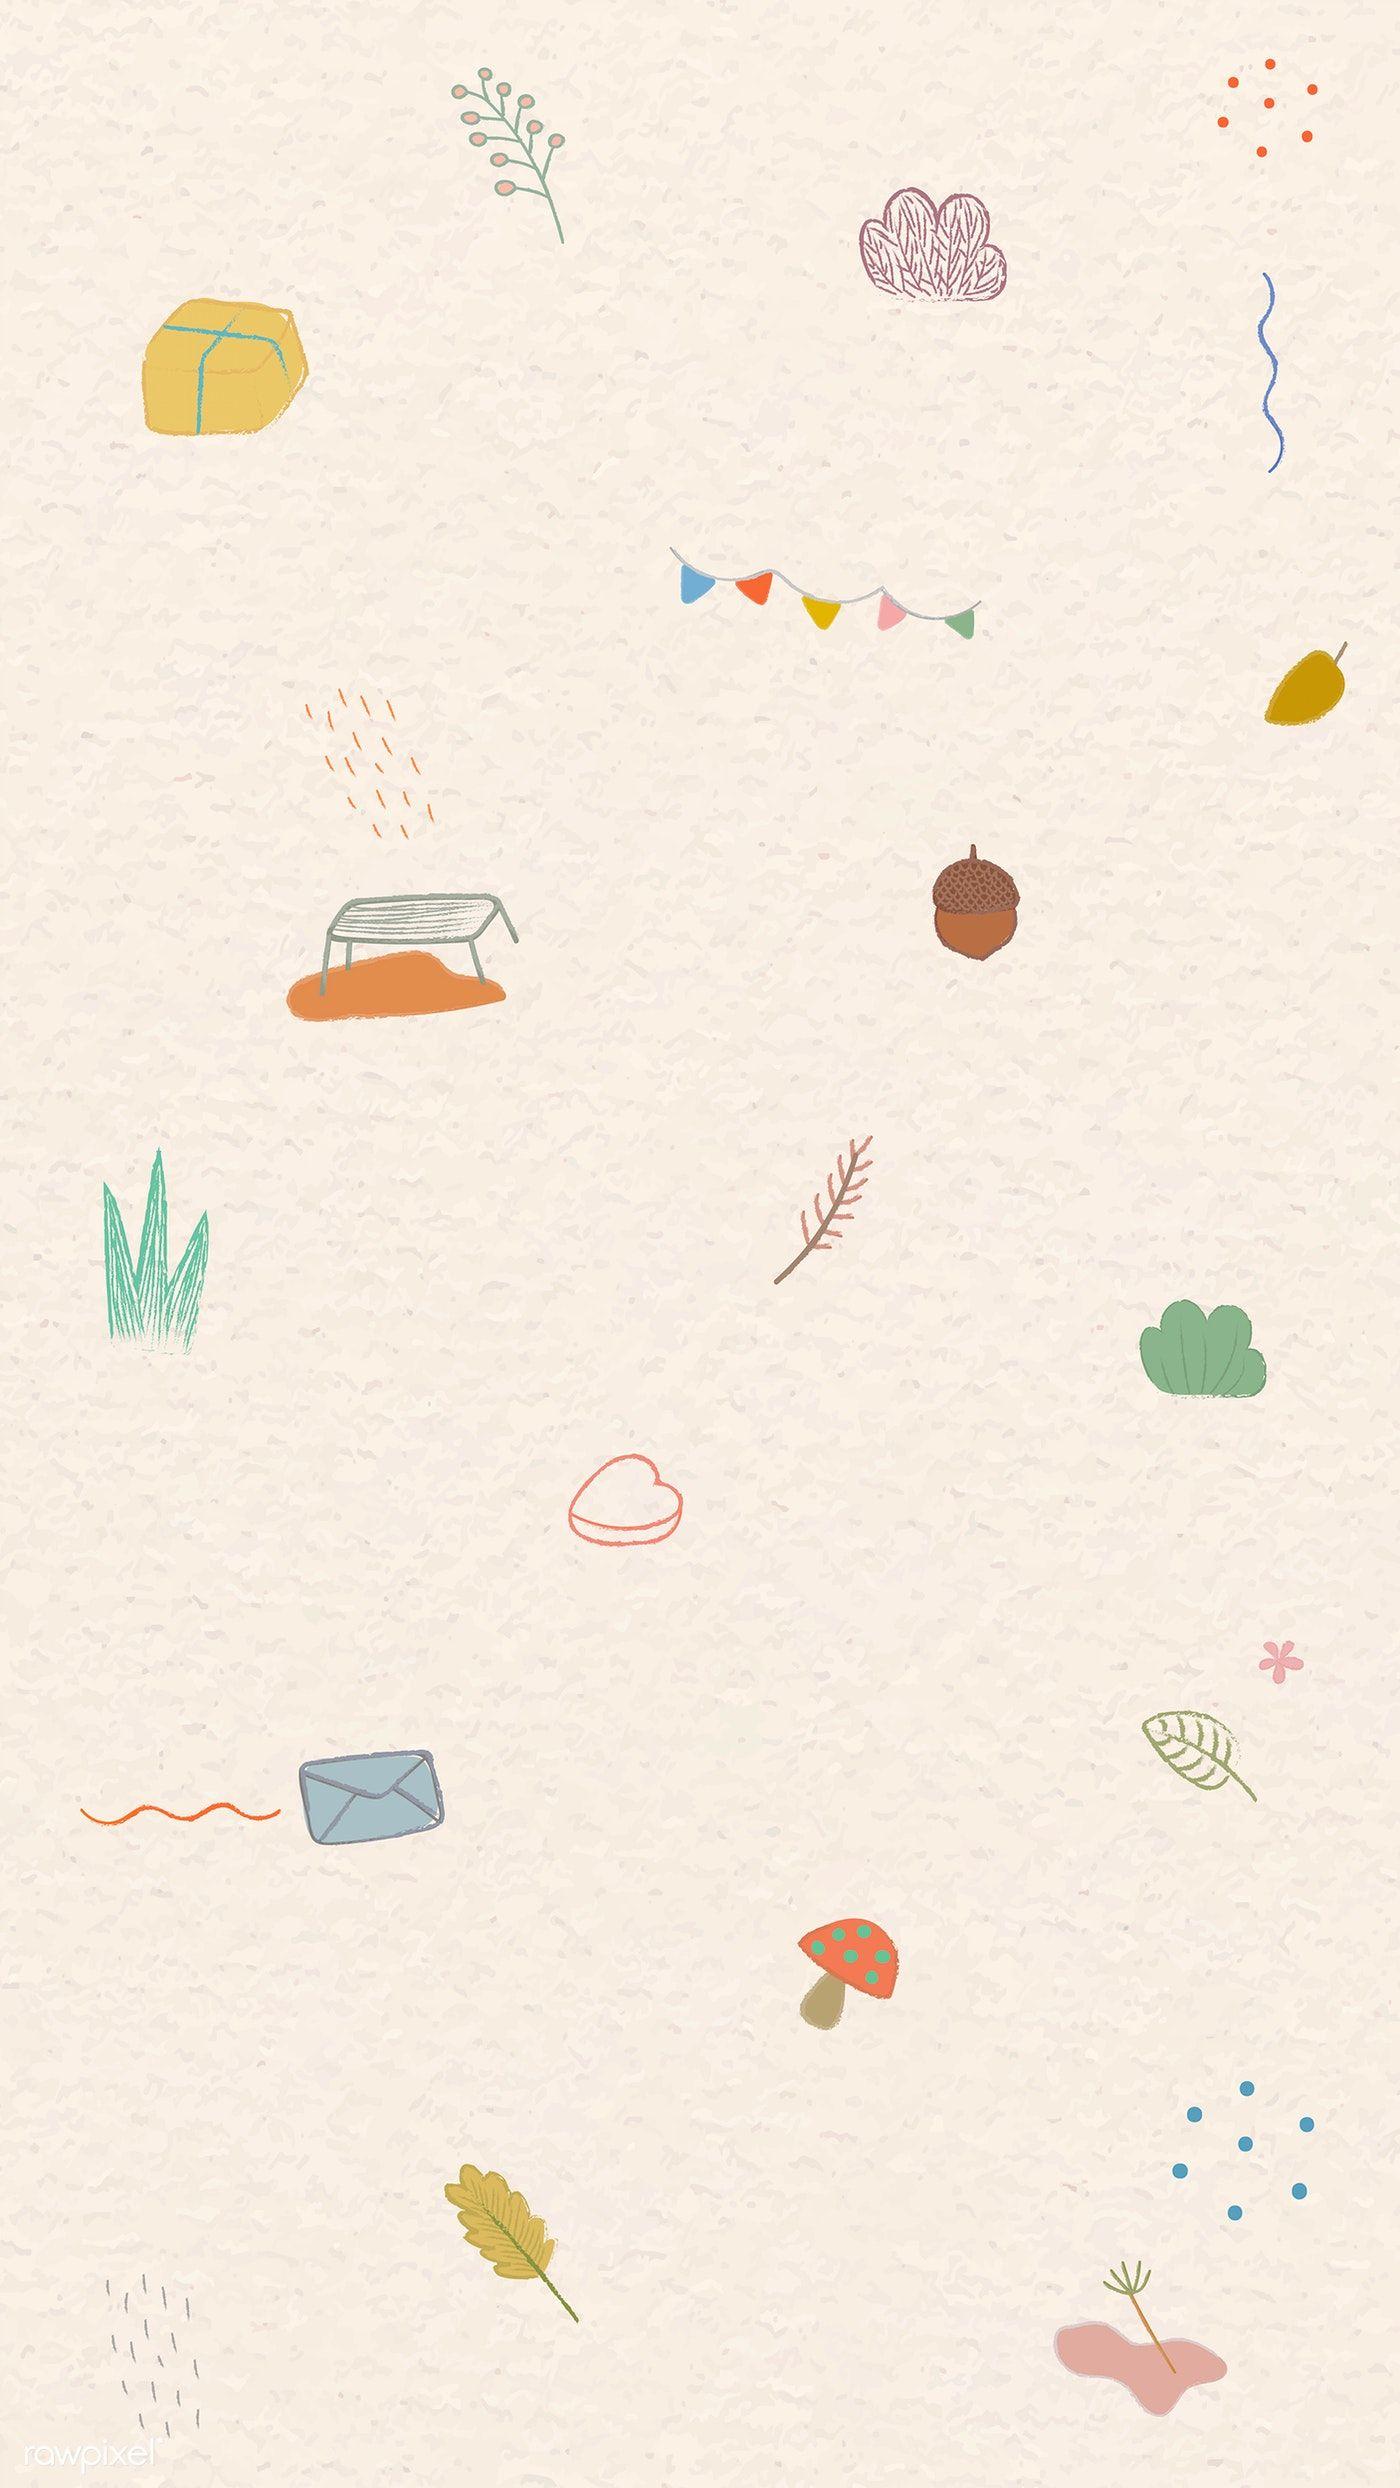 Download Premium Vector Of Cute Autumn Doodle Patterned Mobile Screen Ilustrasi Vintage Ilustrasi Wallpaper Hitam Lucu